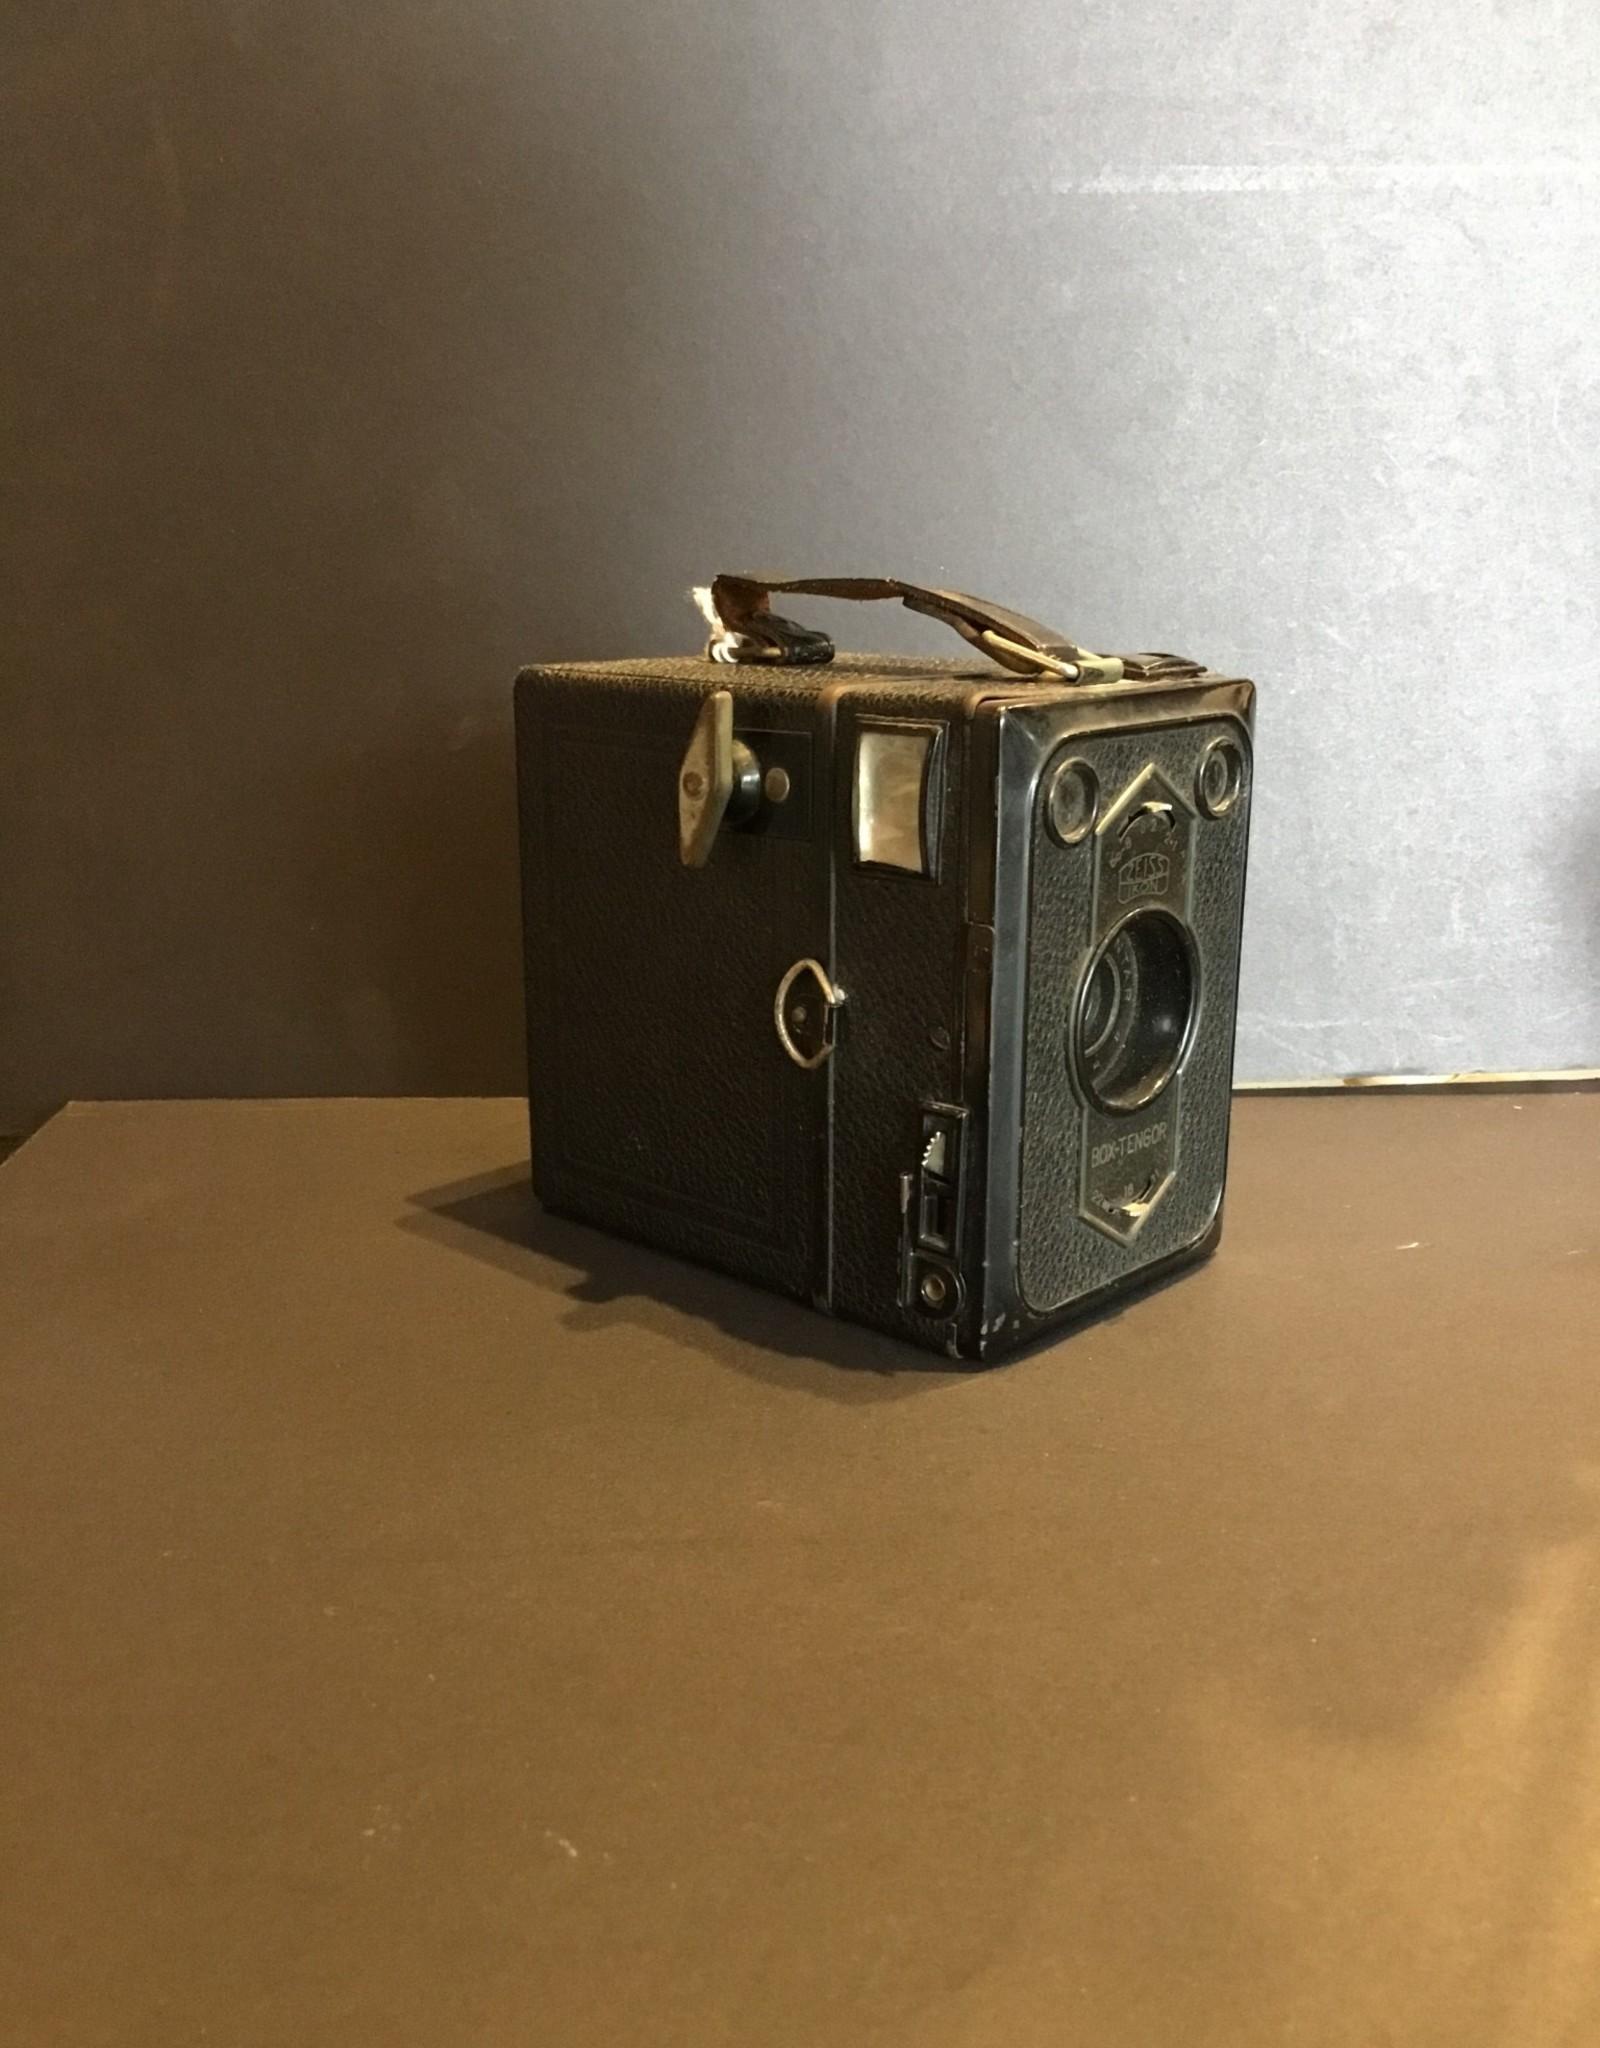 Banda Poka 1927 Video Camera